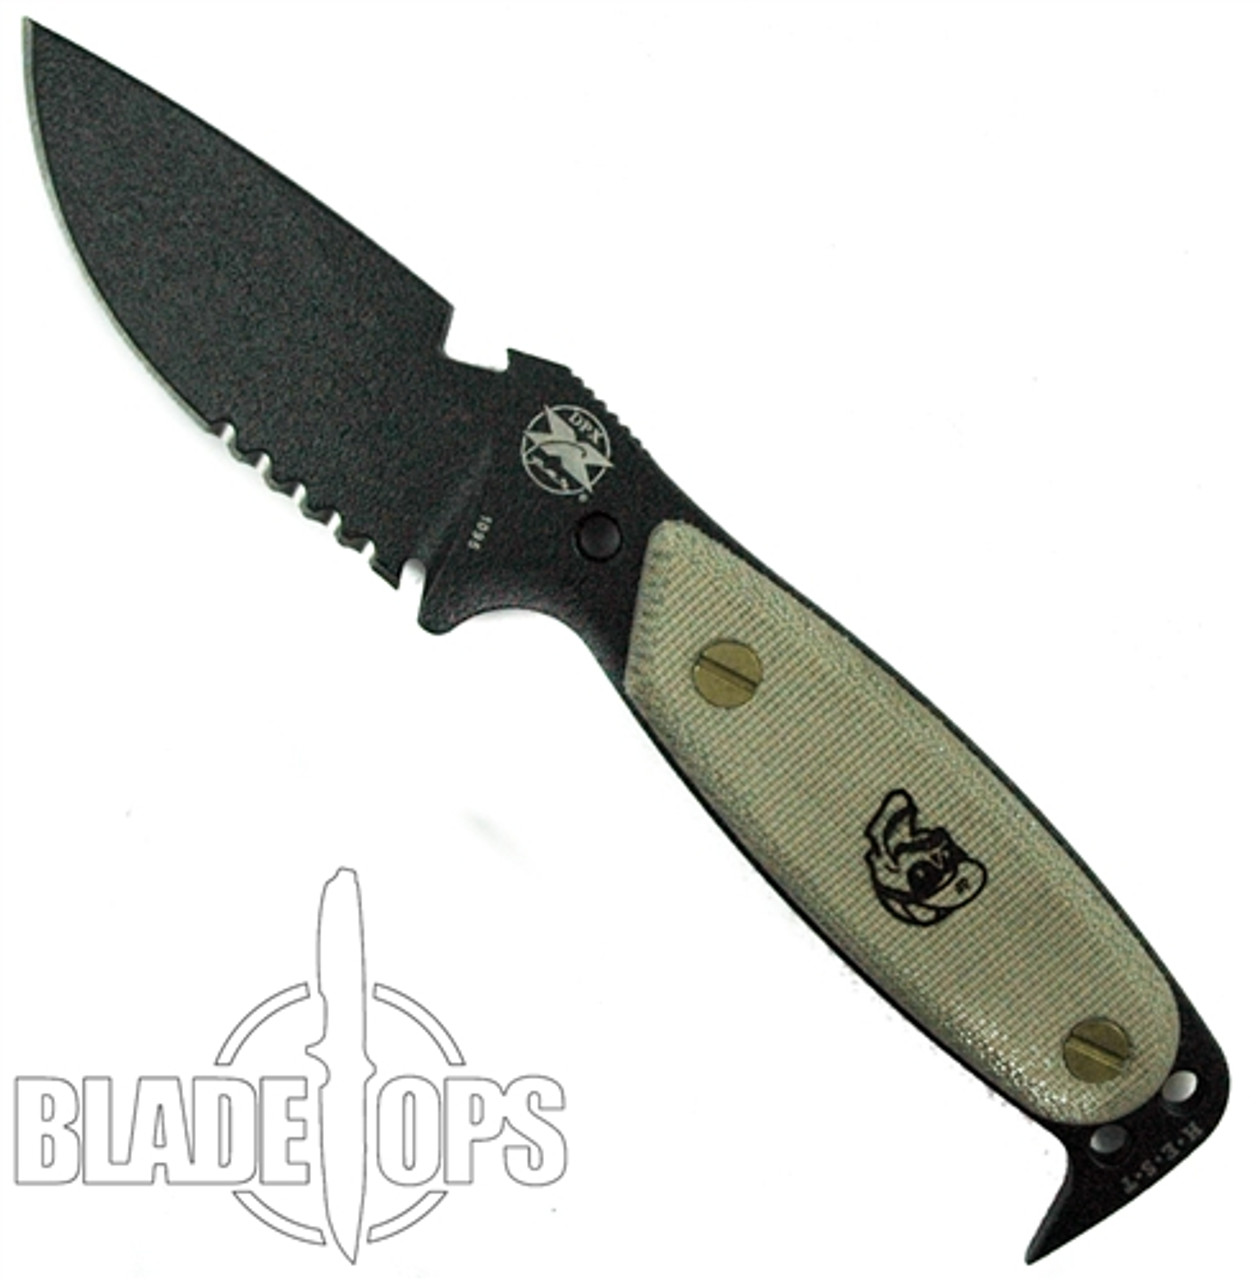 DPx HEST Original Fixed Blade, Black Serrated Blade